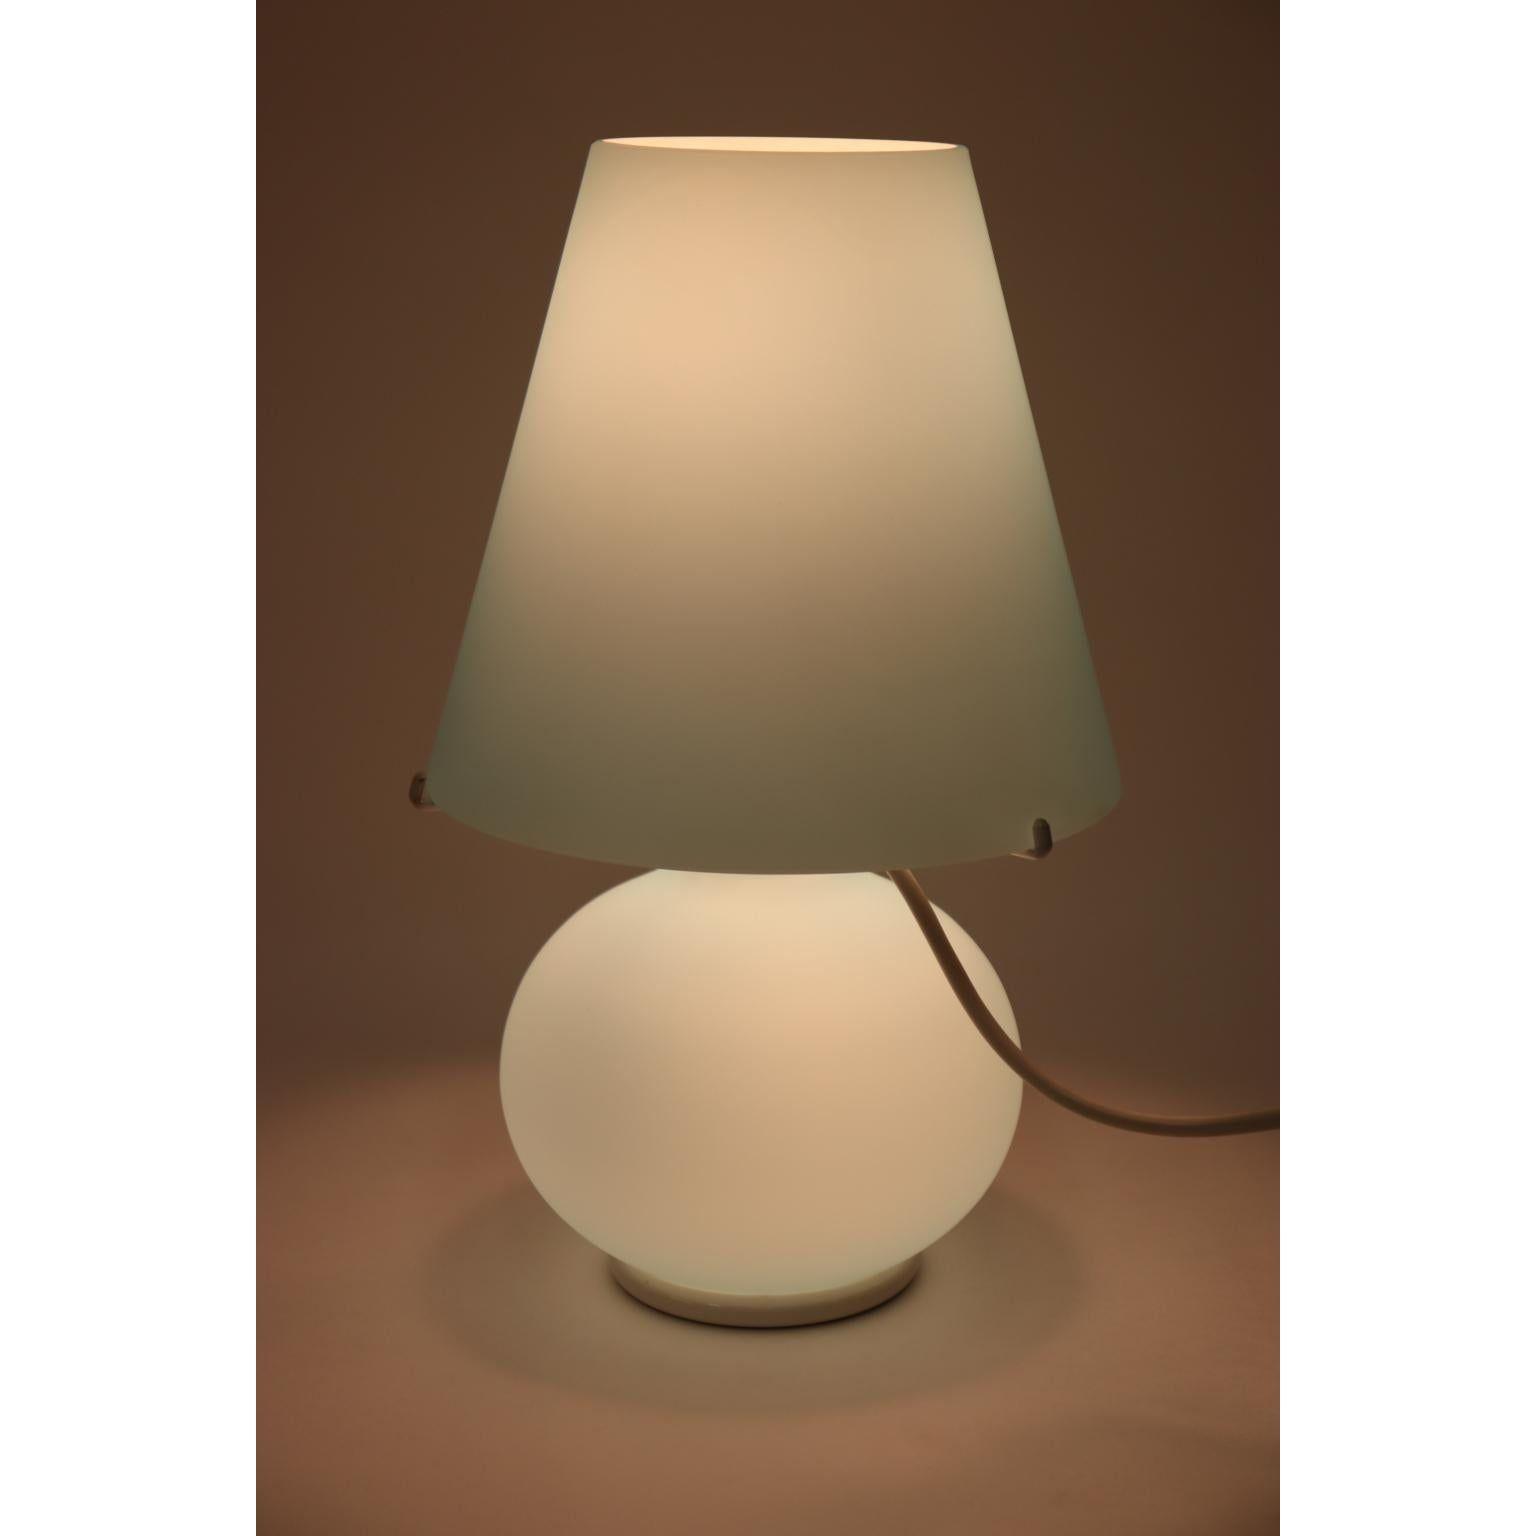 Paralume Murano Due Mid Century Modern Glass Table Lamp In 2020 Modern Glass Table Lamps Glass Table Lamp Modern Glass